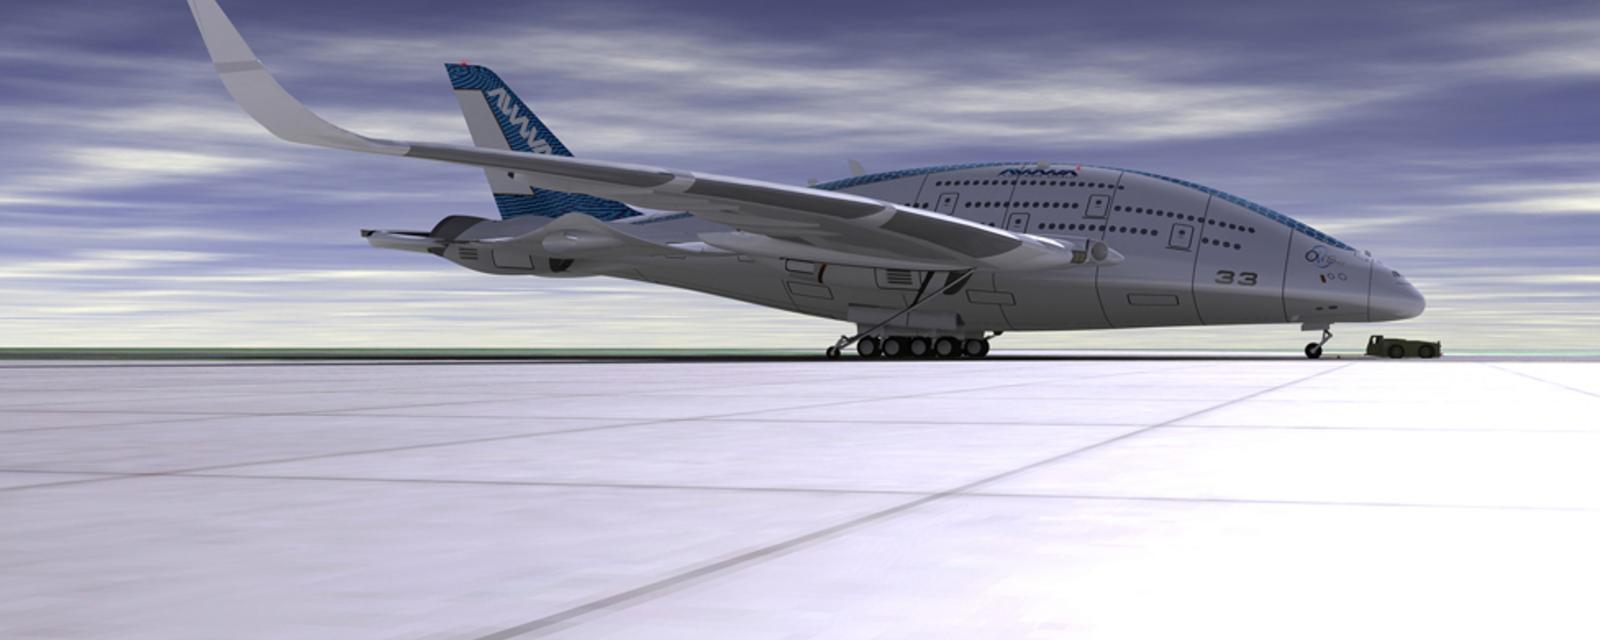 AWWA Sky Whale (Oscar Vinals) (Credit: Oscar Vinals)